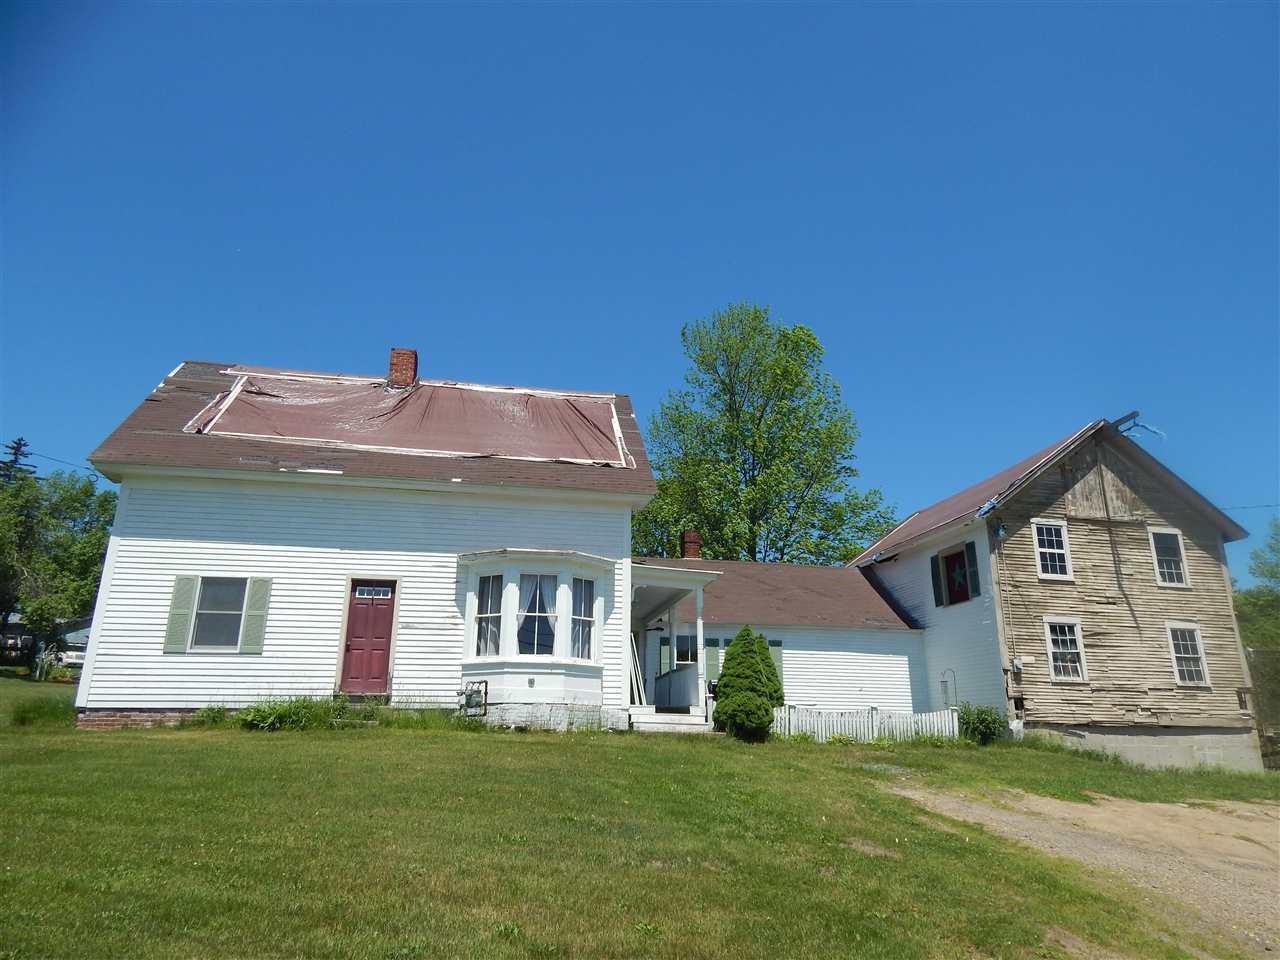 77 Winter St, Tilton, NH — MLS# 4670653 — Better Homes and ... Tilton Nh Homes For Sale Photos